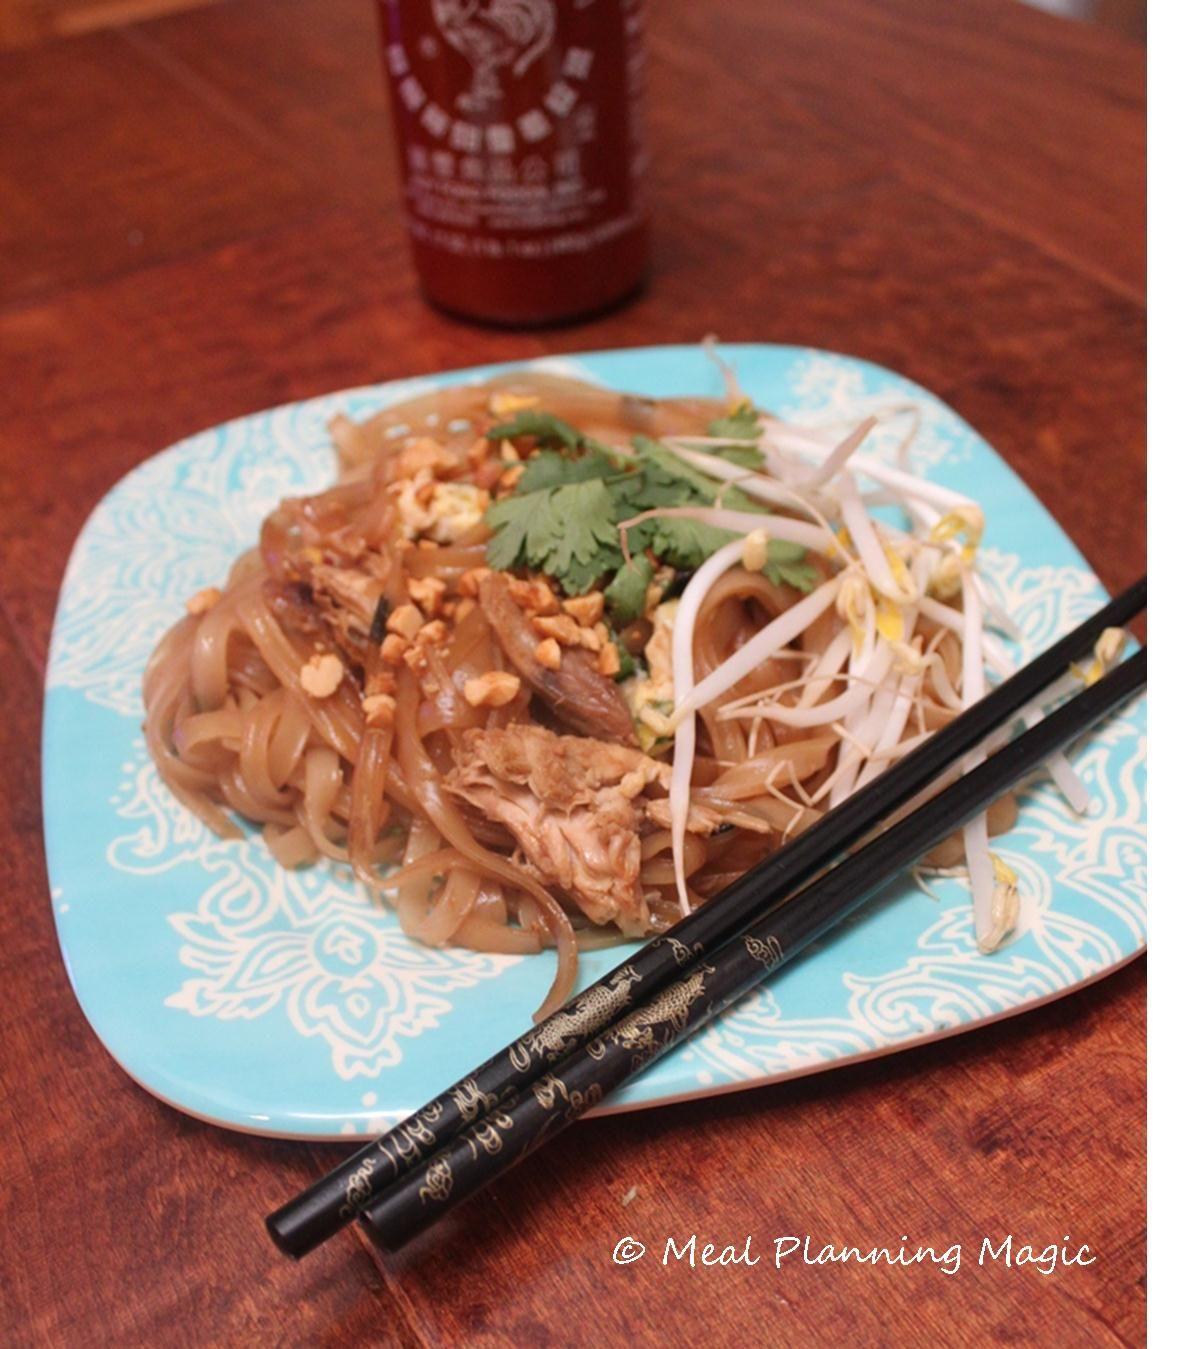 padthai pretty good.. not like the padthai at restaurants